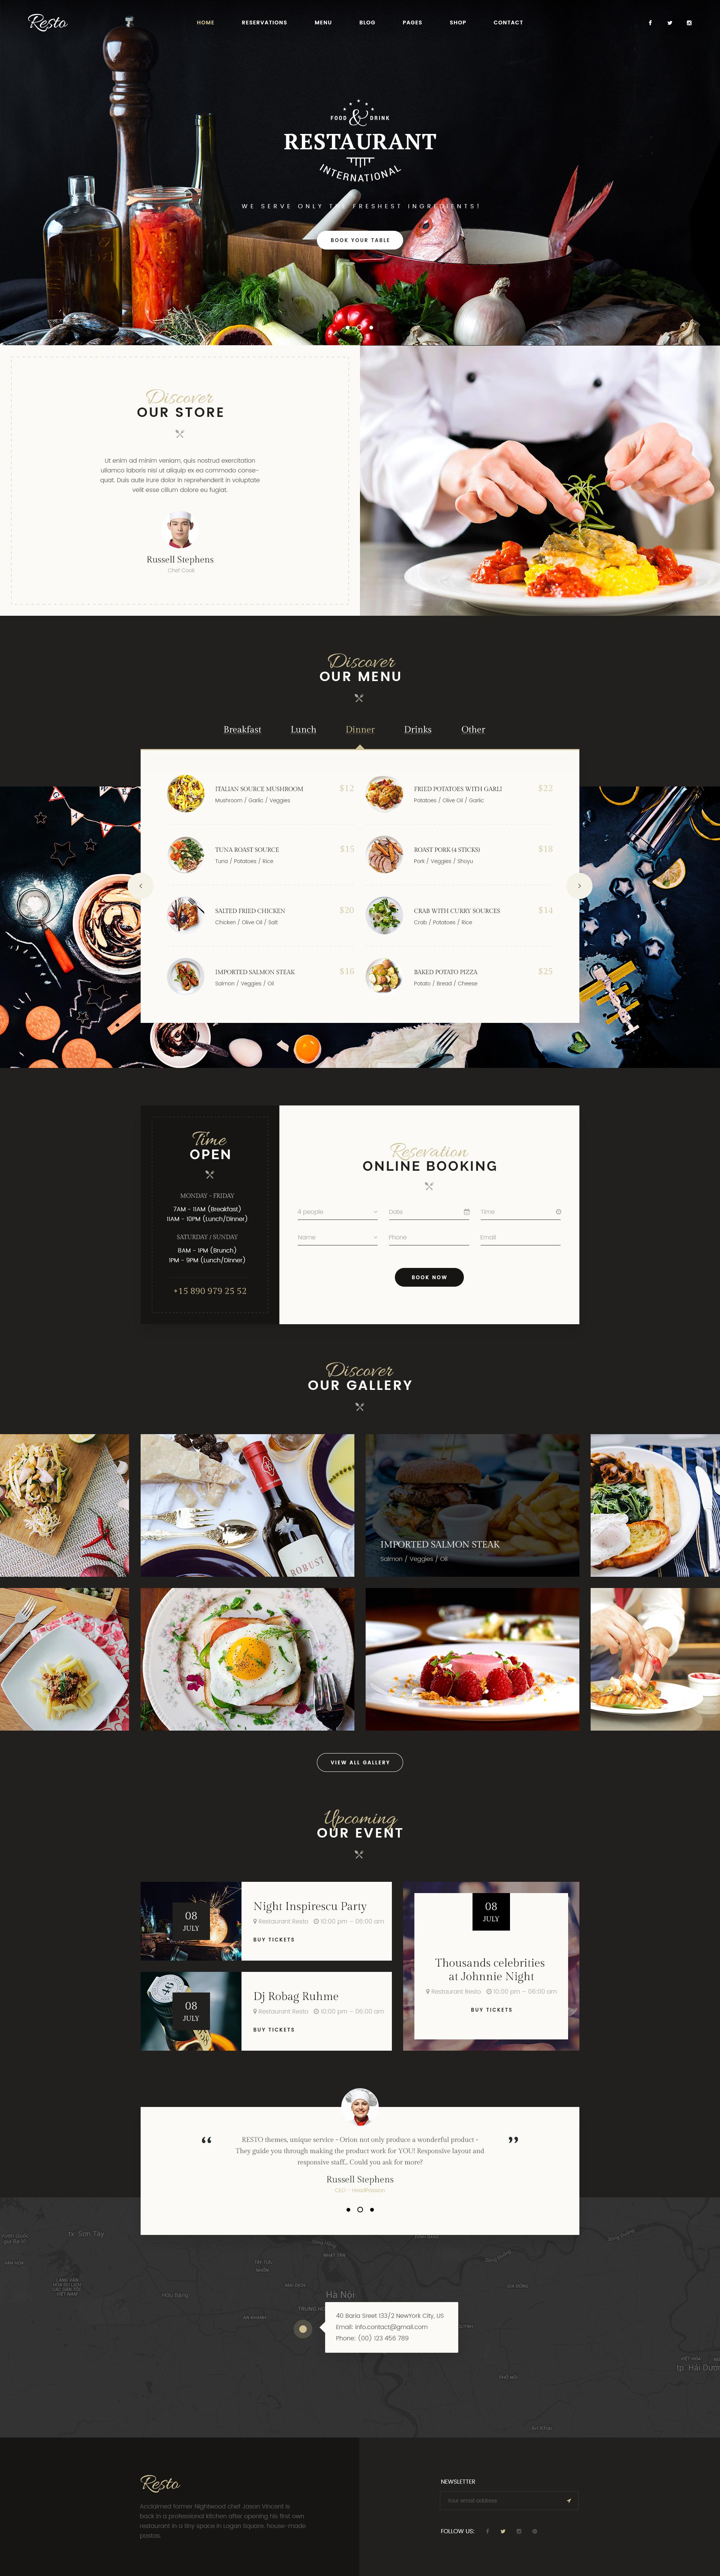 Resto multipurpose restaurant cafe psd template by for Design a restaurant online